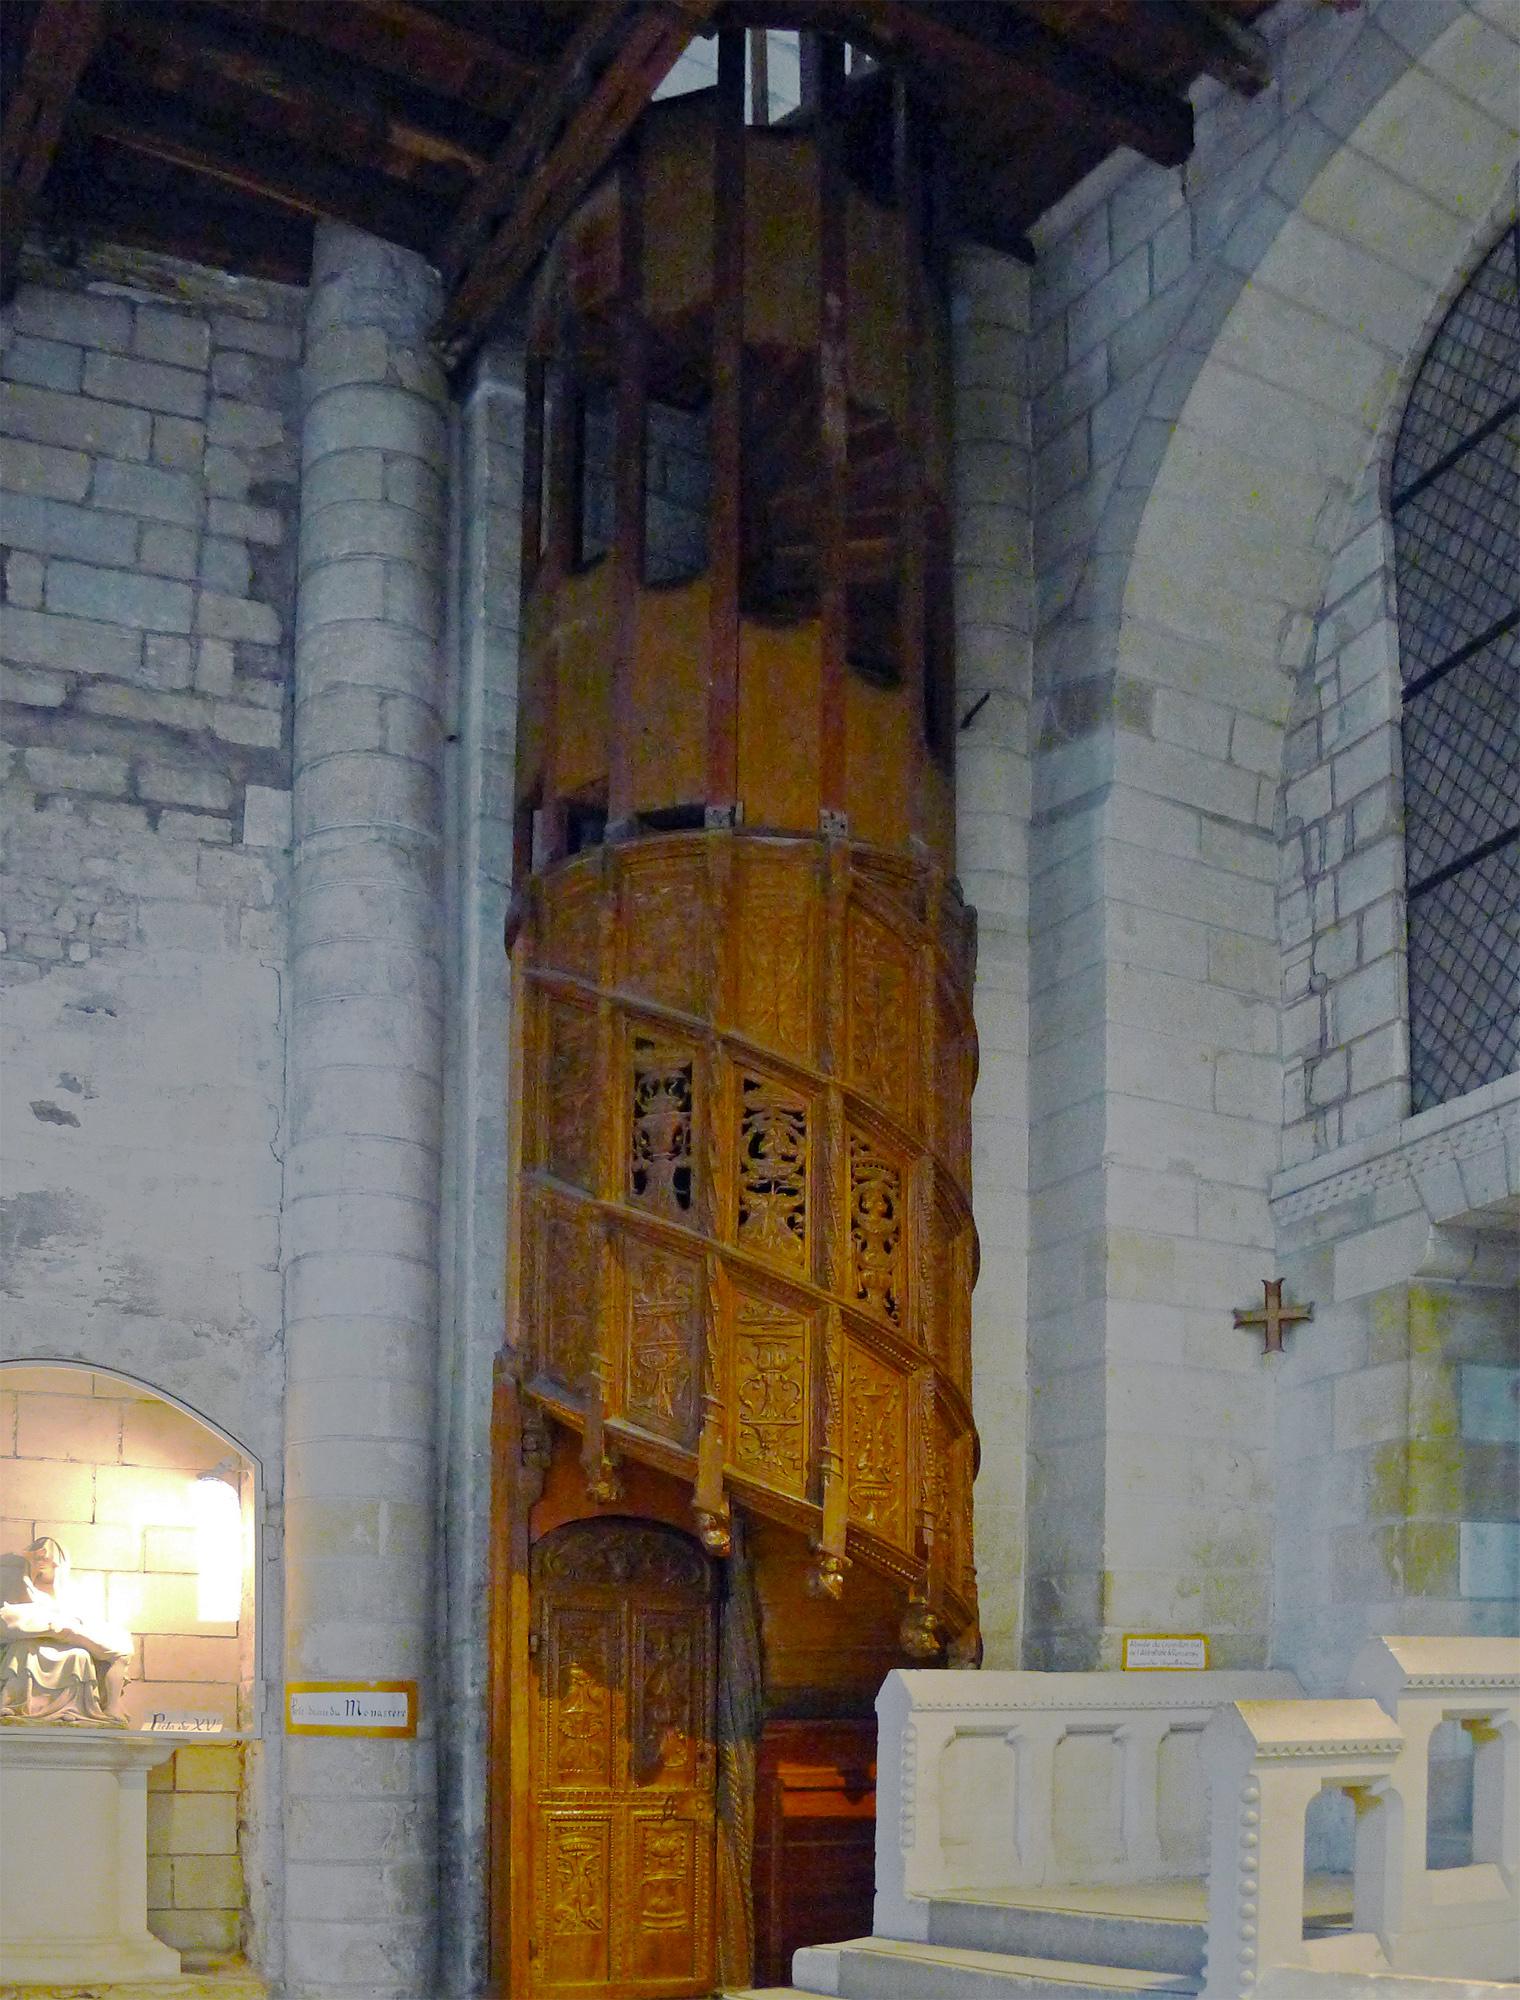 file p1320054 angers eglise trinite escalier wikimedia commons. Black Bedroom Furniture Sets. Home Design Ideas